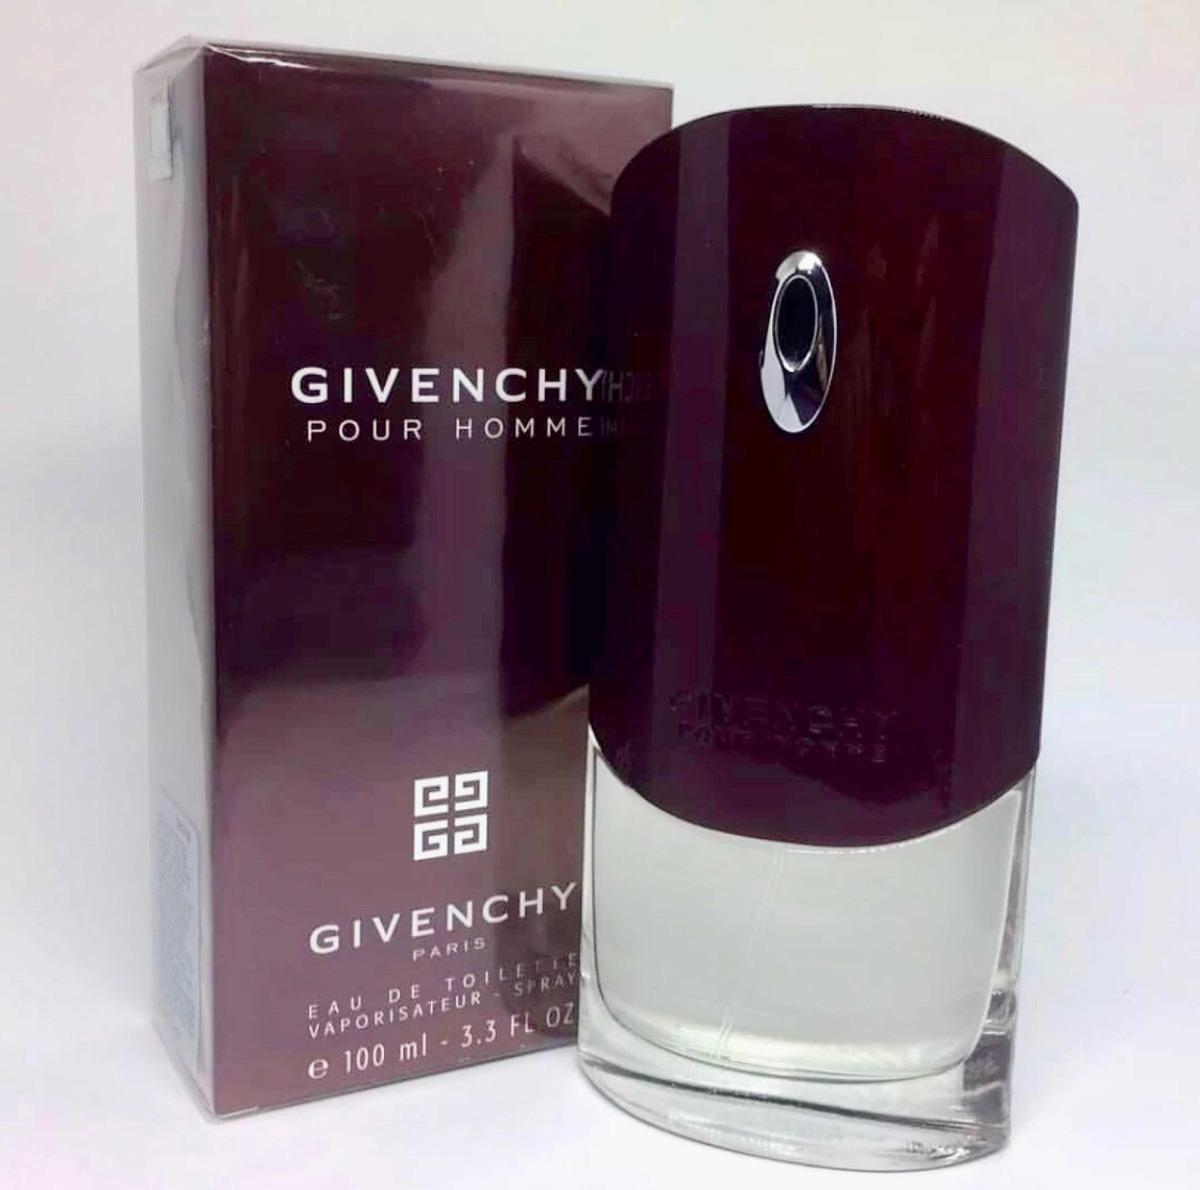 Givenchy Ml Pour Homme Hombre 100 Original Sellado Perfume DW29EIH